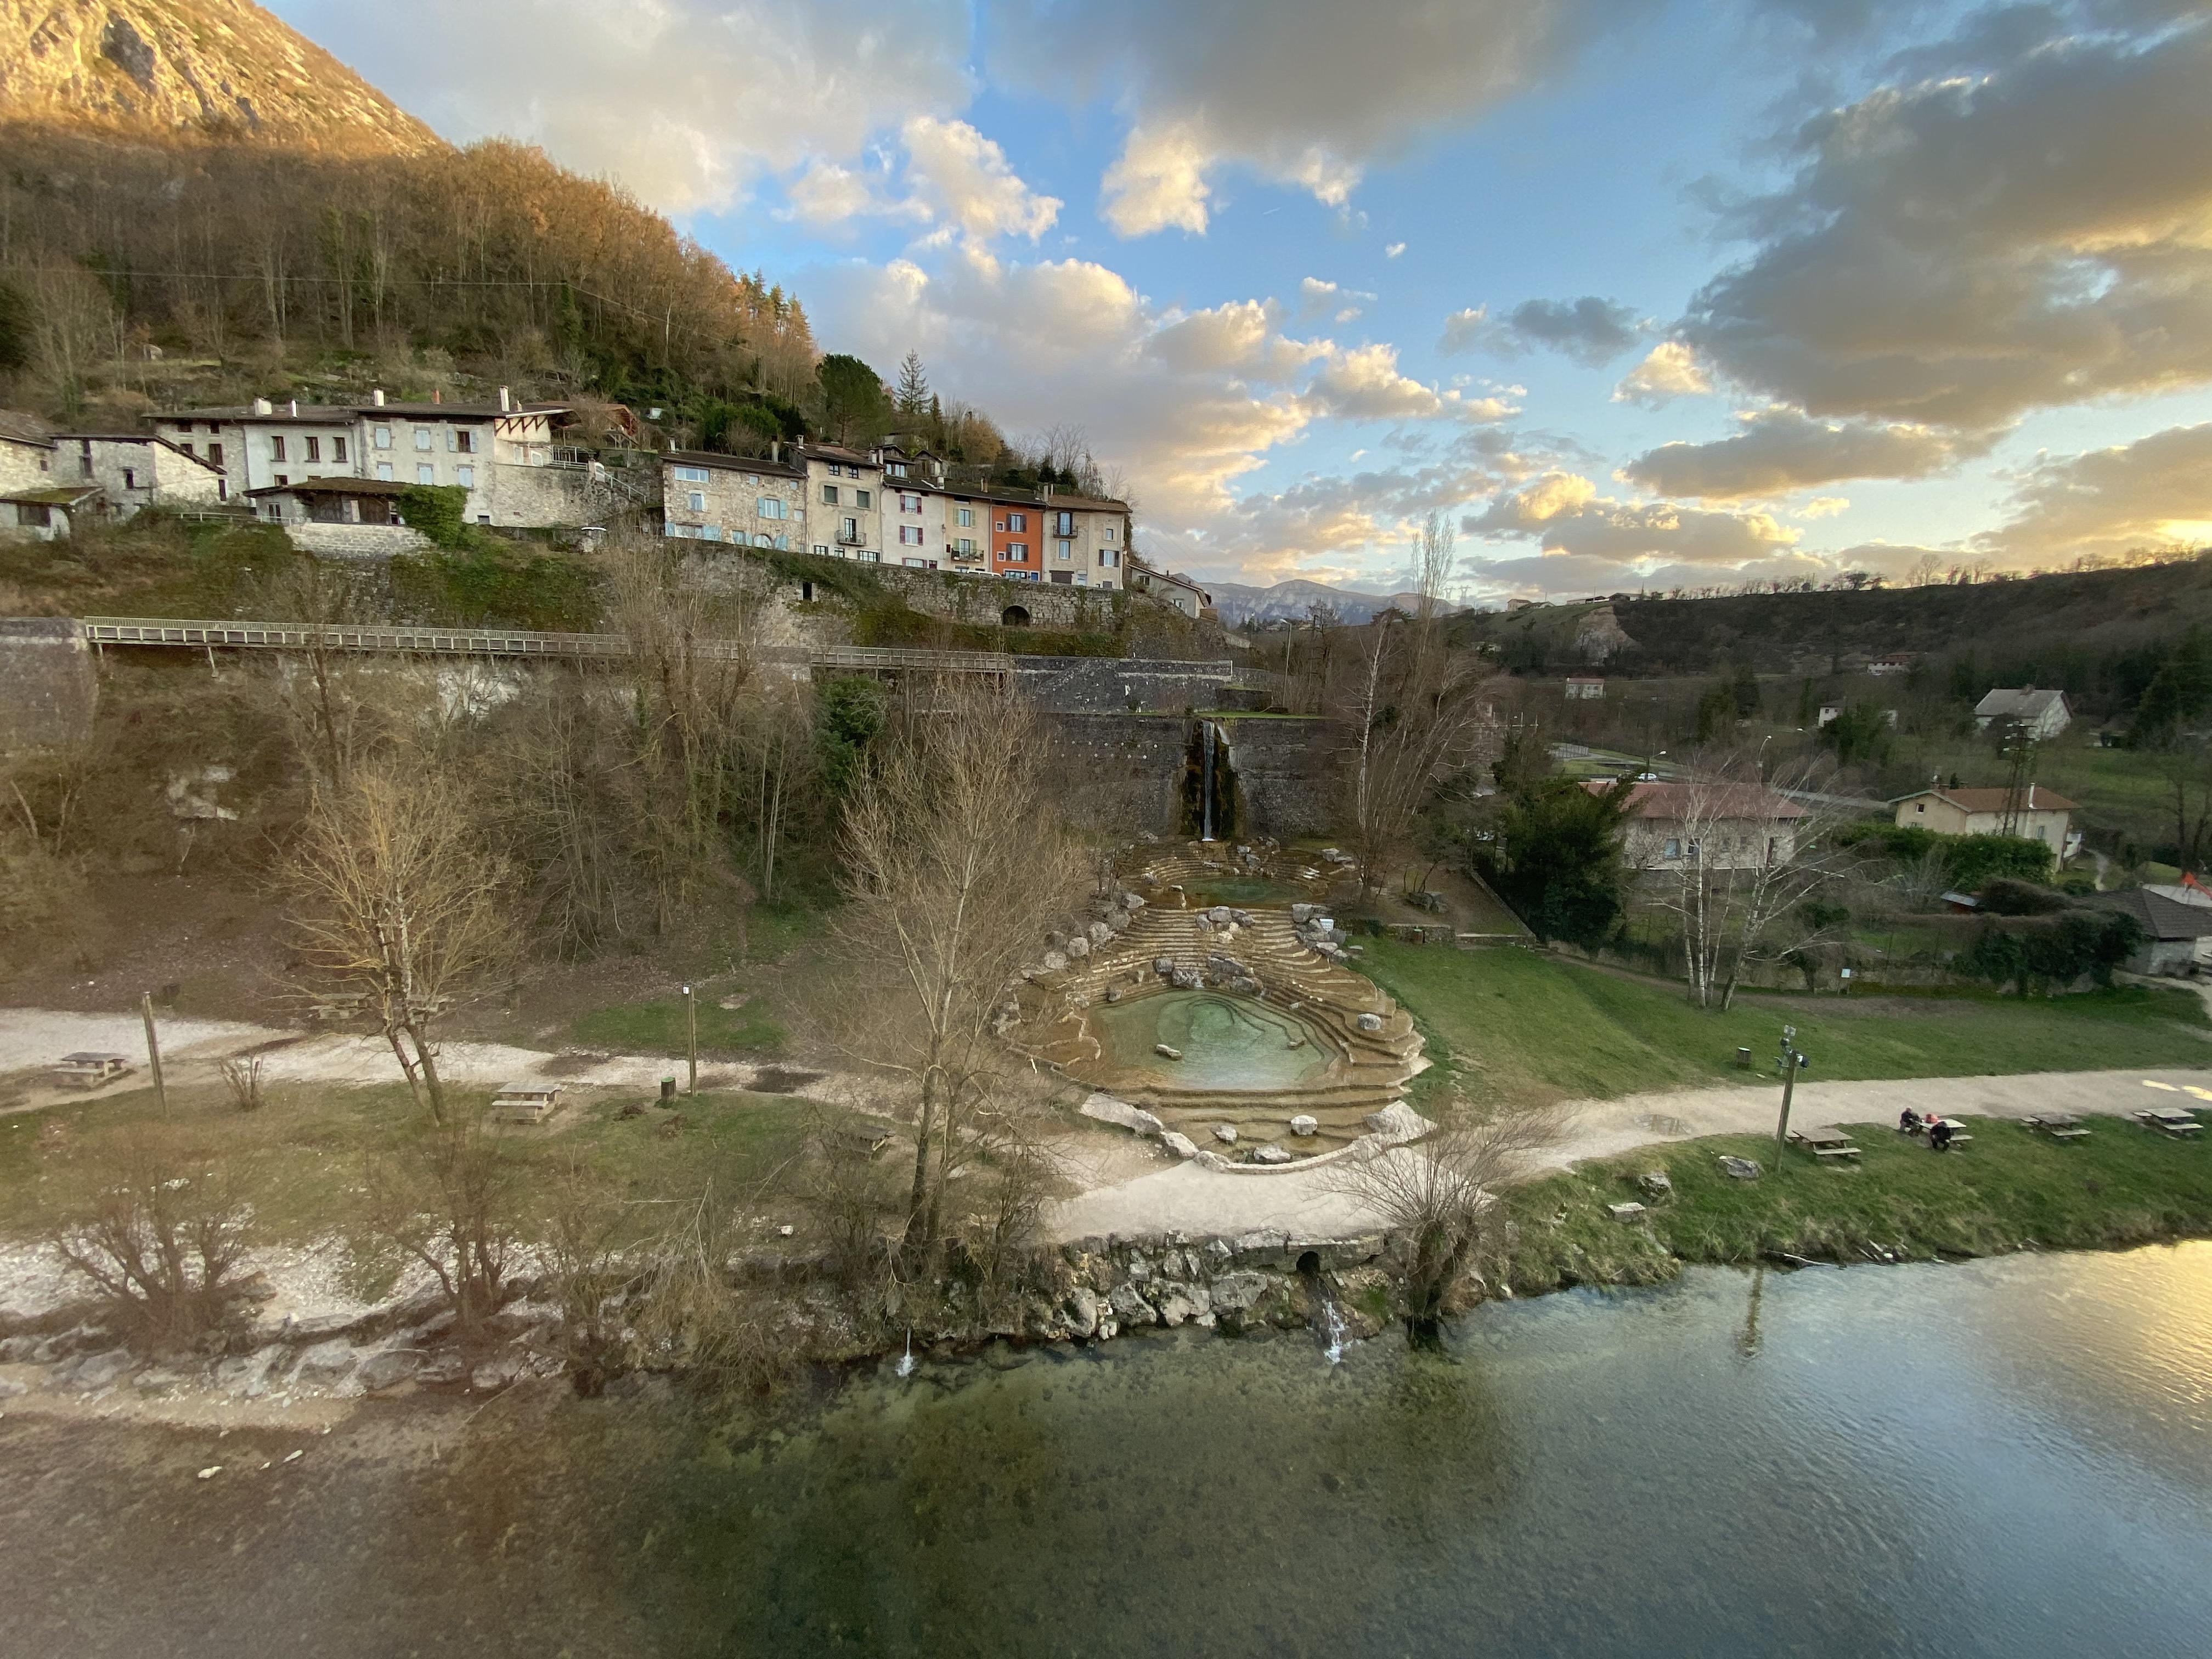 2020-Spring-Rehl-Ryan-Pont-en-Royans-3